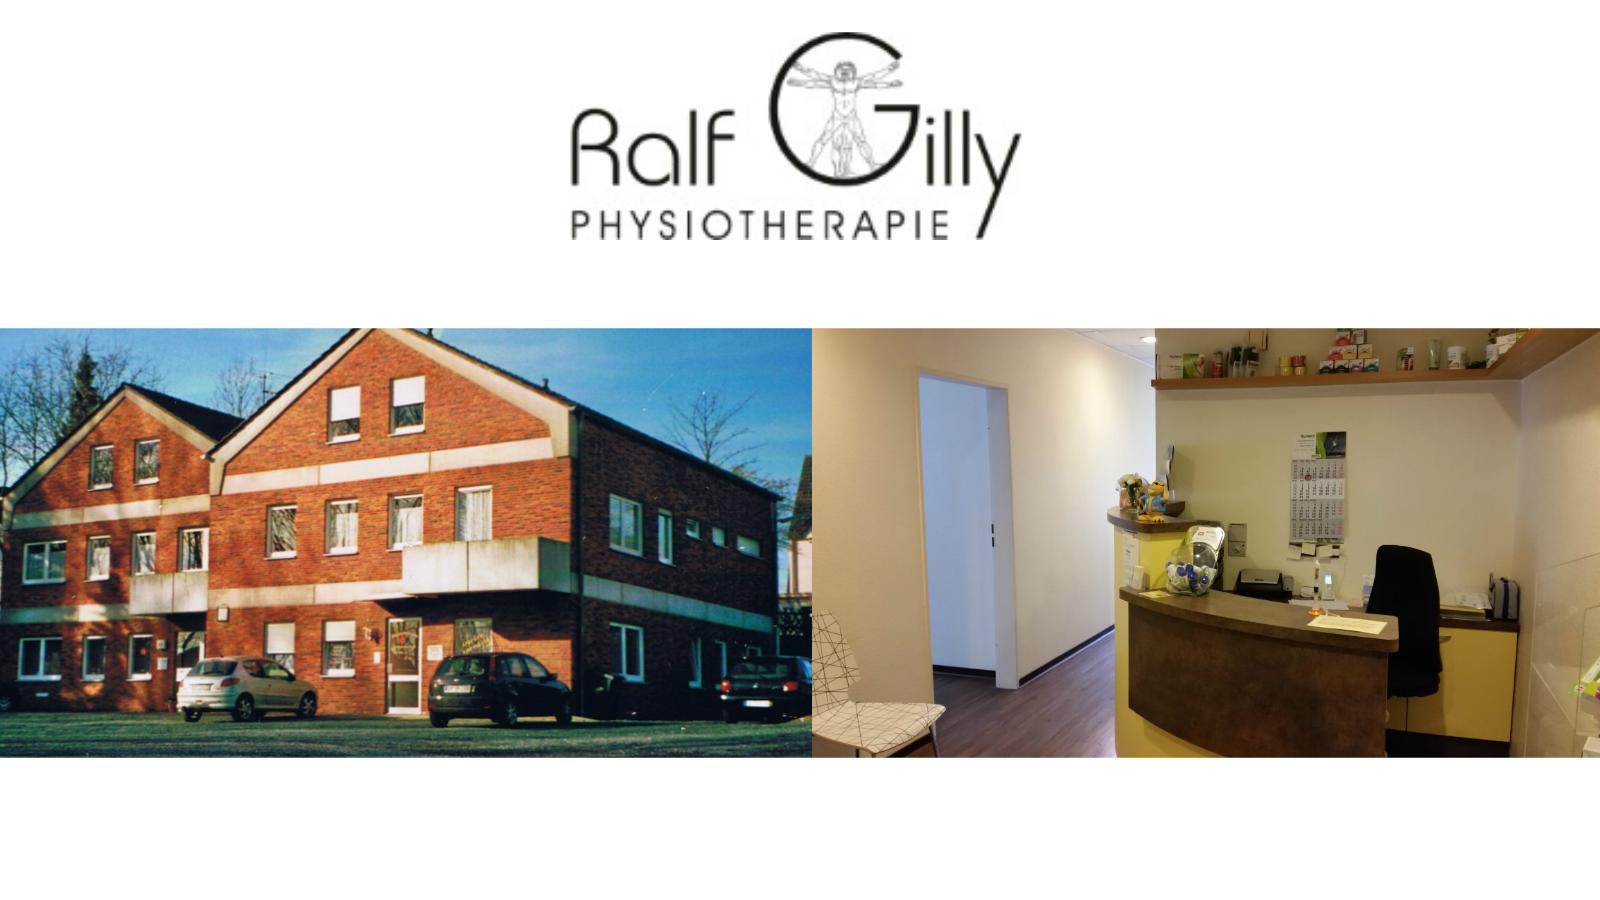 Ralf Gilly Physiotherapie